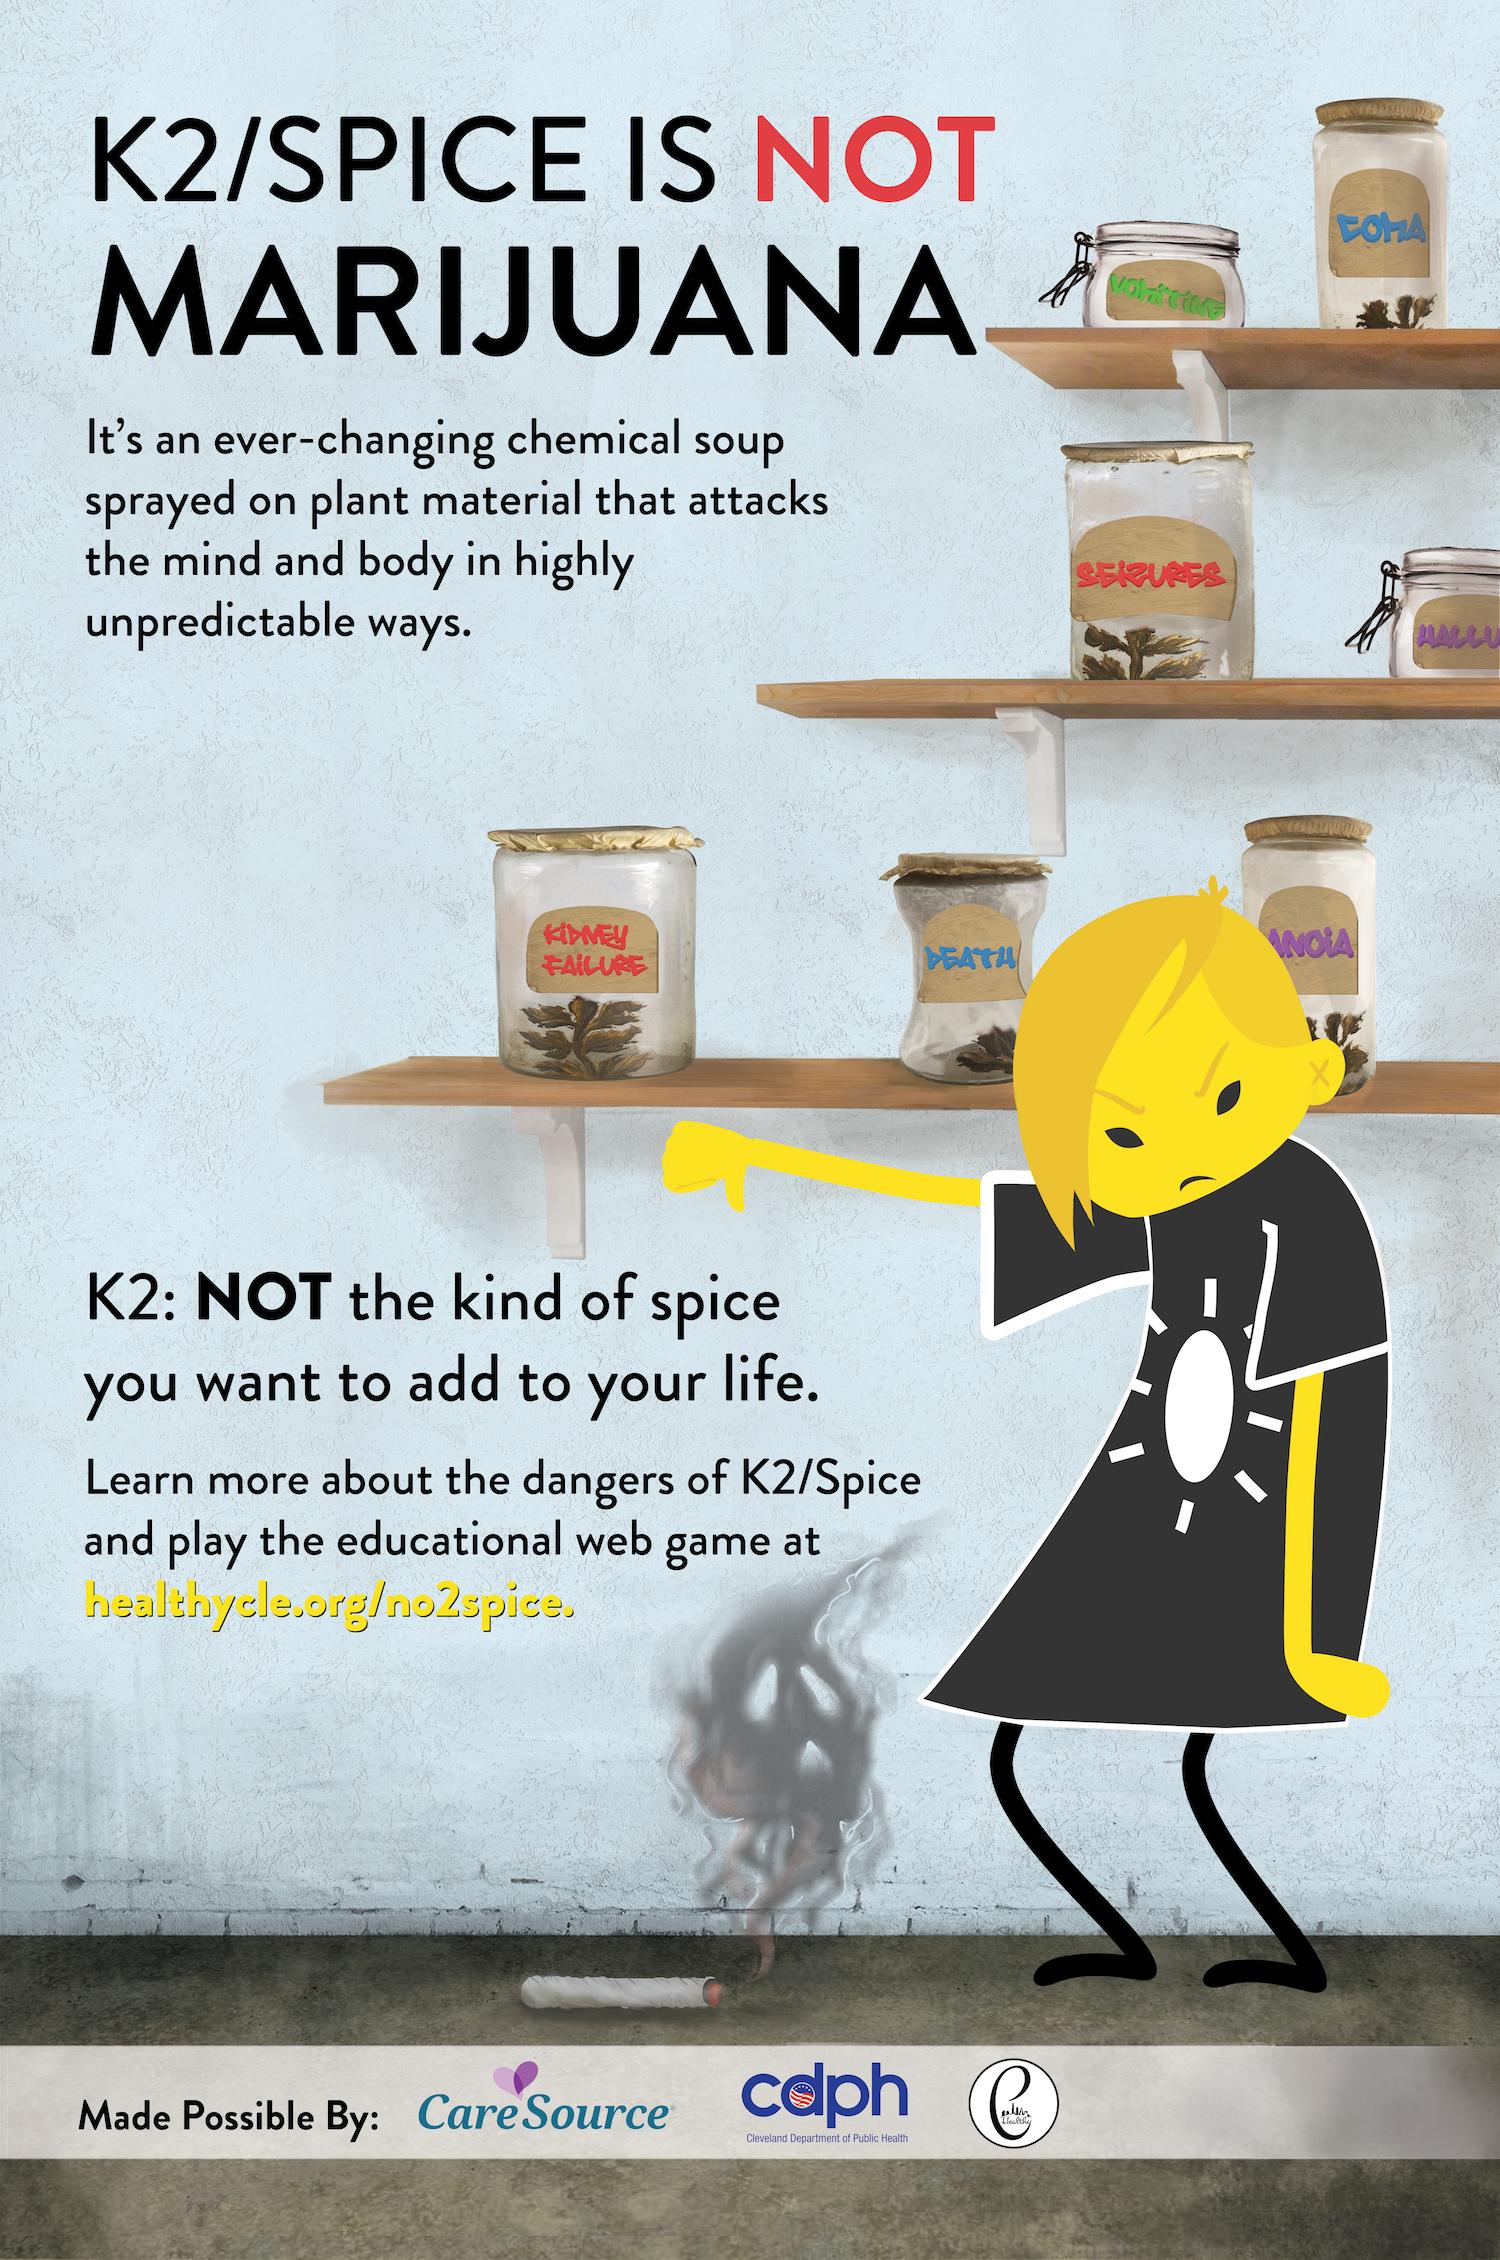 K2 Spice Poster 1 final version (Web).png